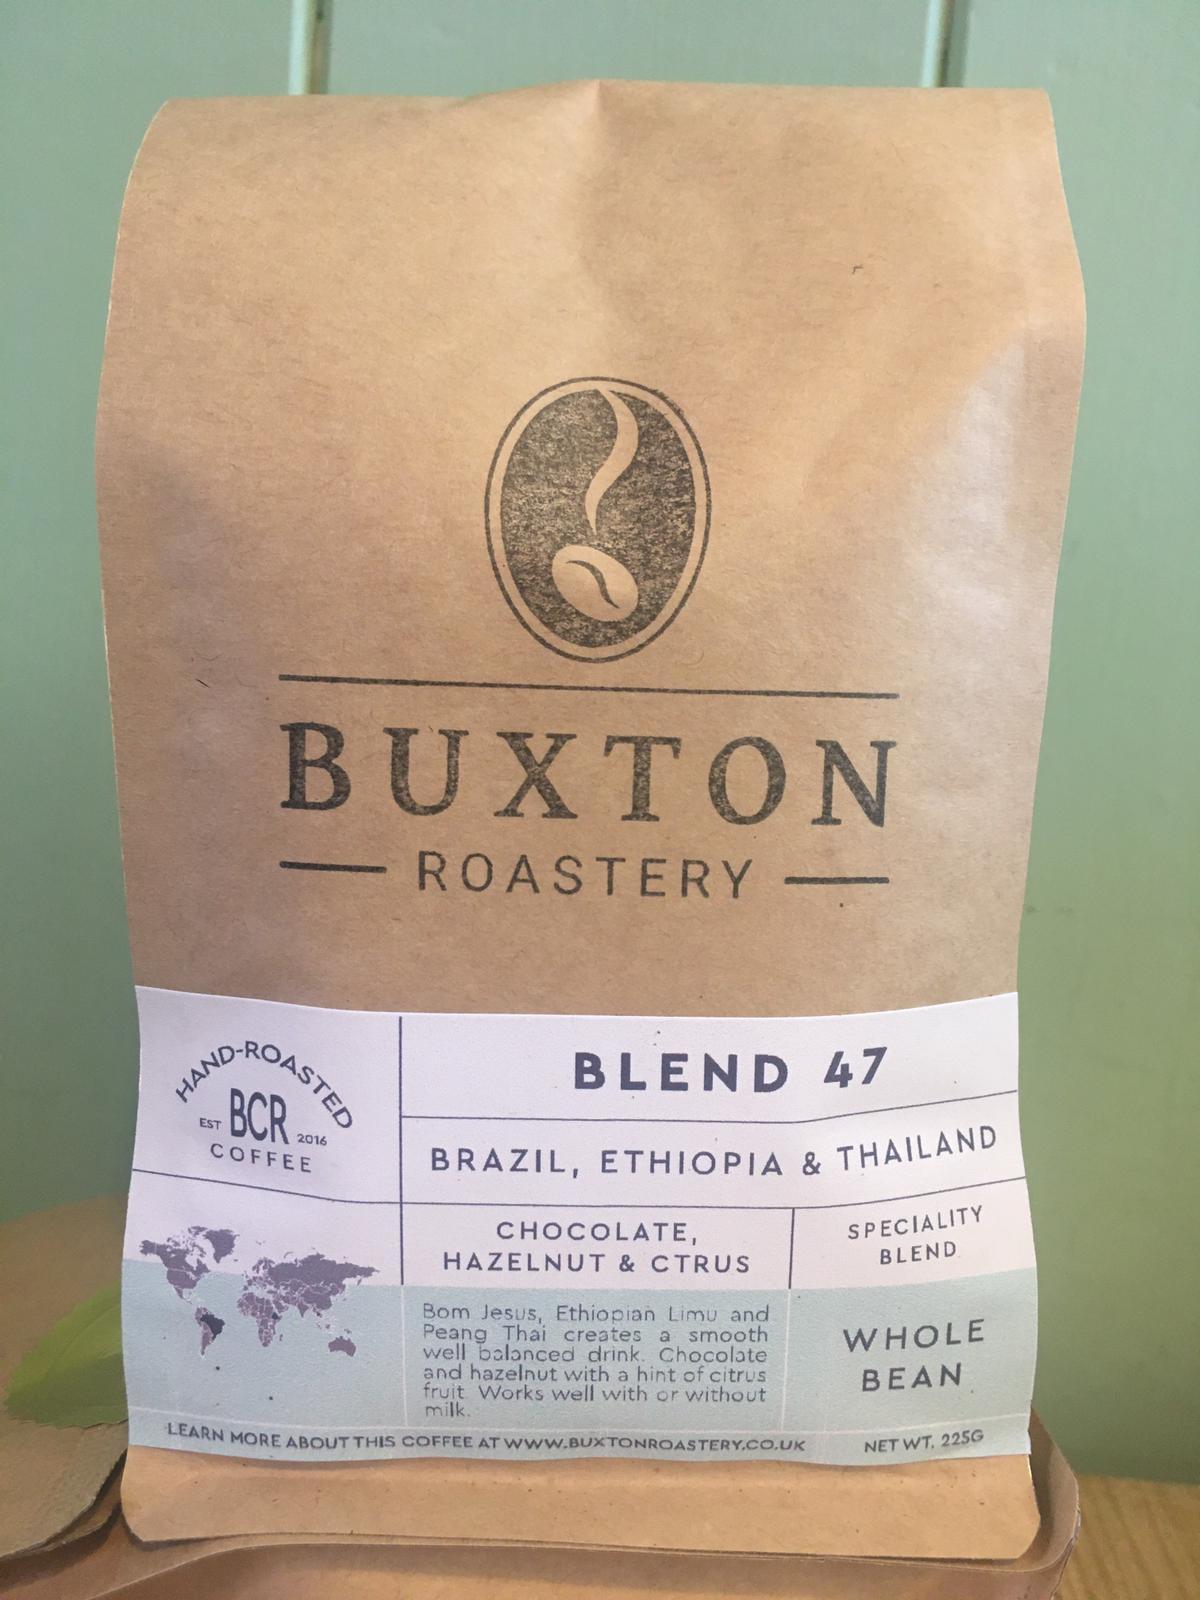 Buxton Roastery Coffee - Blend 47 (A Blend of Brazilian, Ethiopian and Thai Coffee) 225g